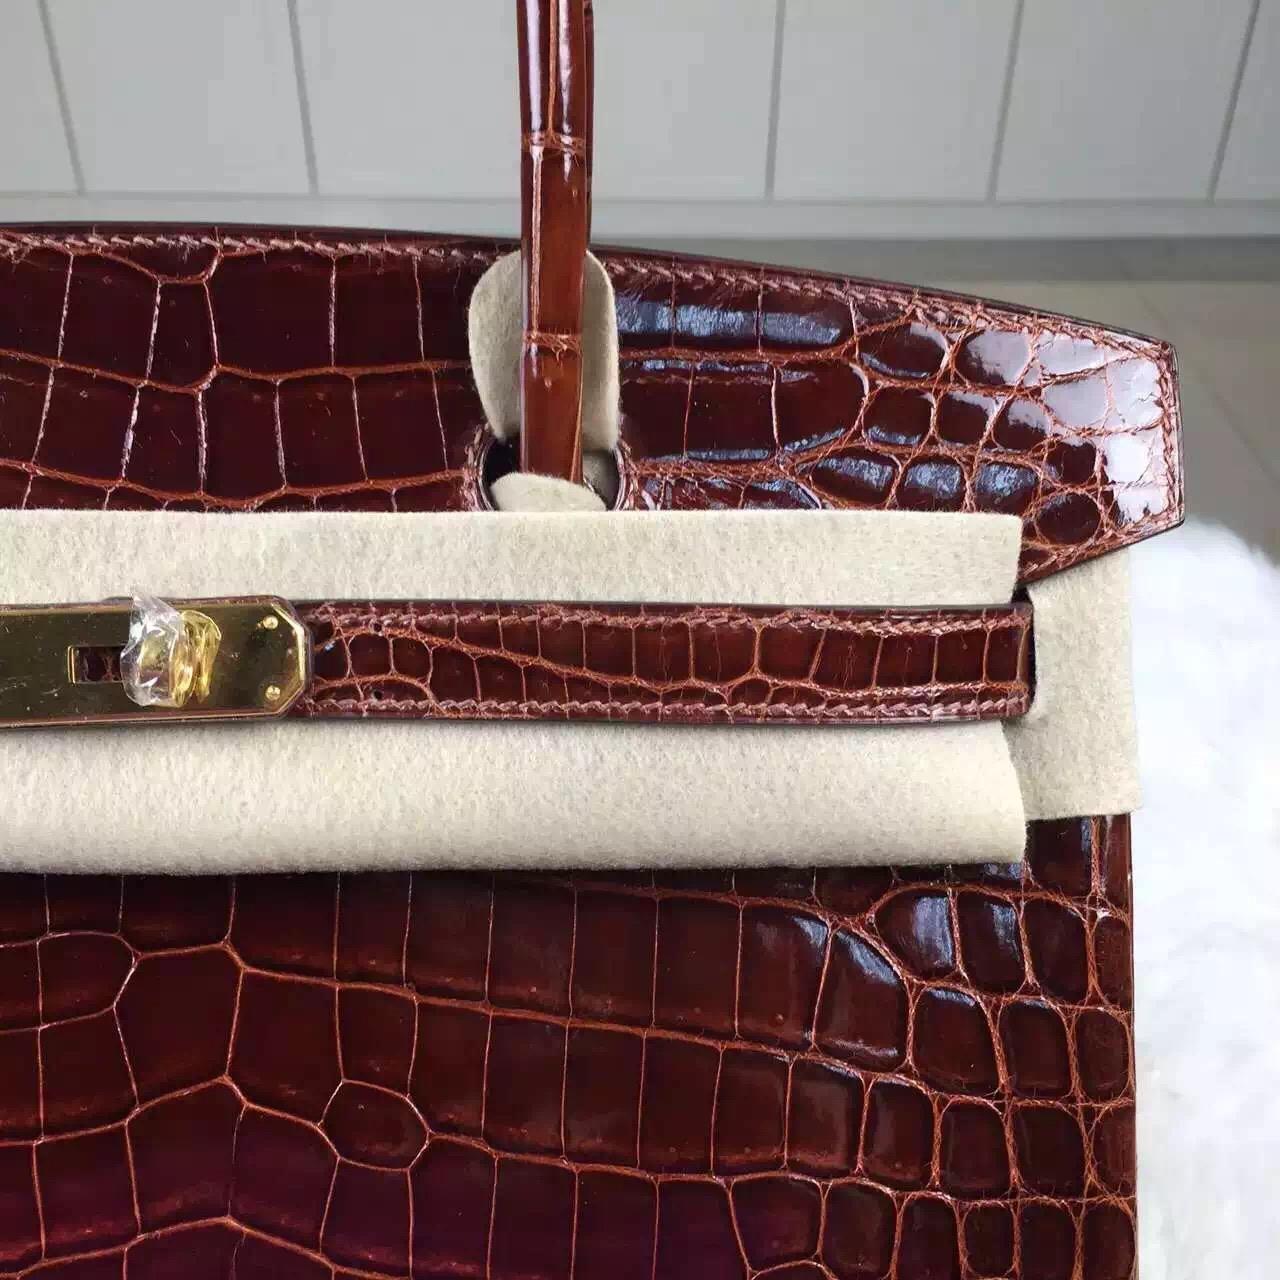 Sale Hermes Birkin Bag30cm CK33 Honey Brown Crocodile Shiny Leather Tote Bag